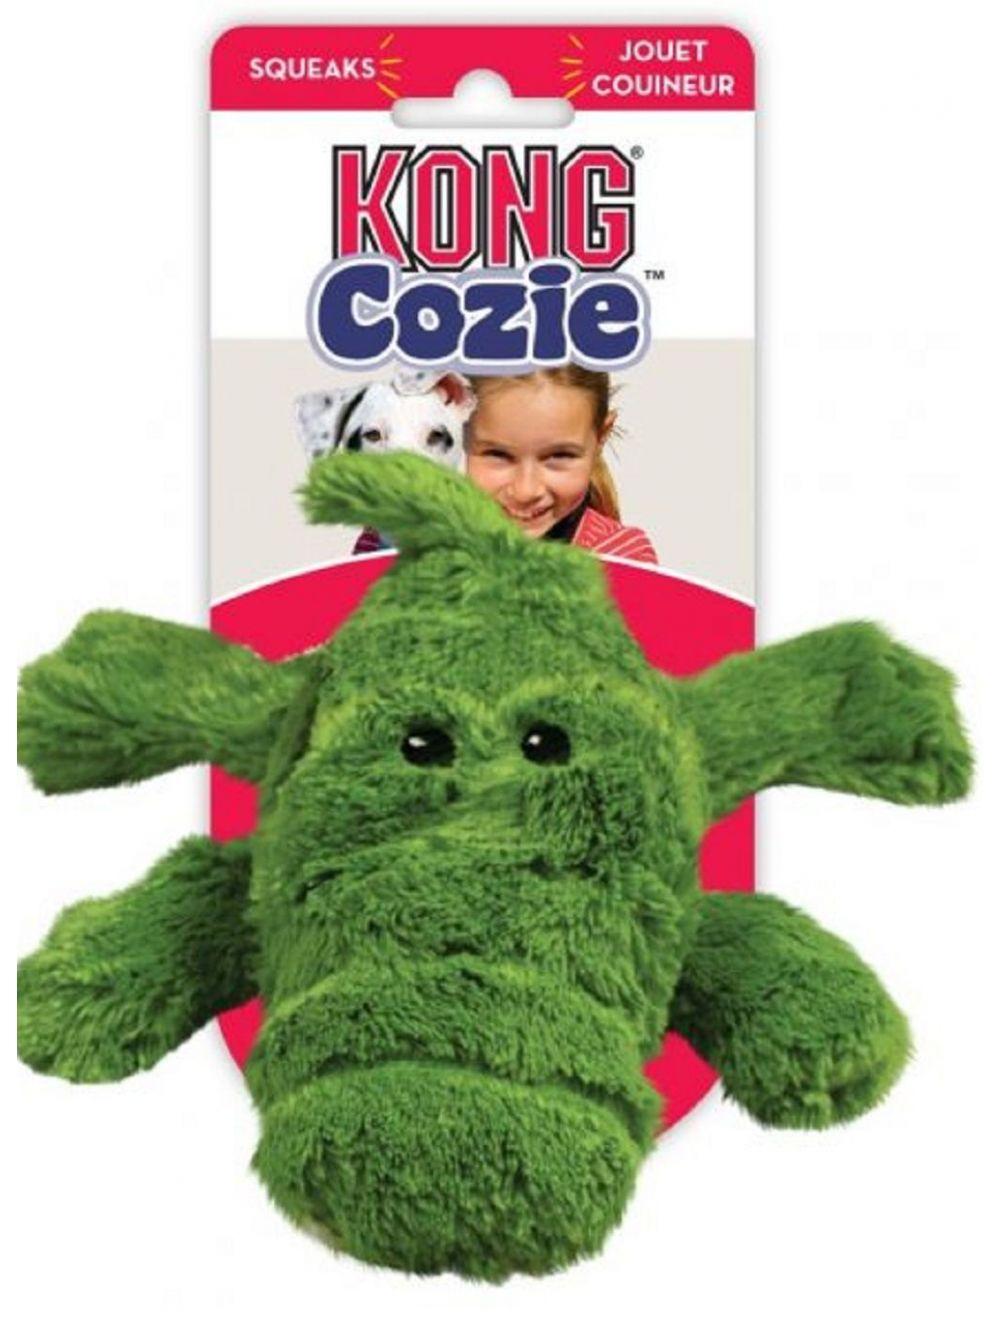 Kong perro peluche cozie cocodrilo medium